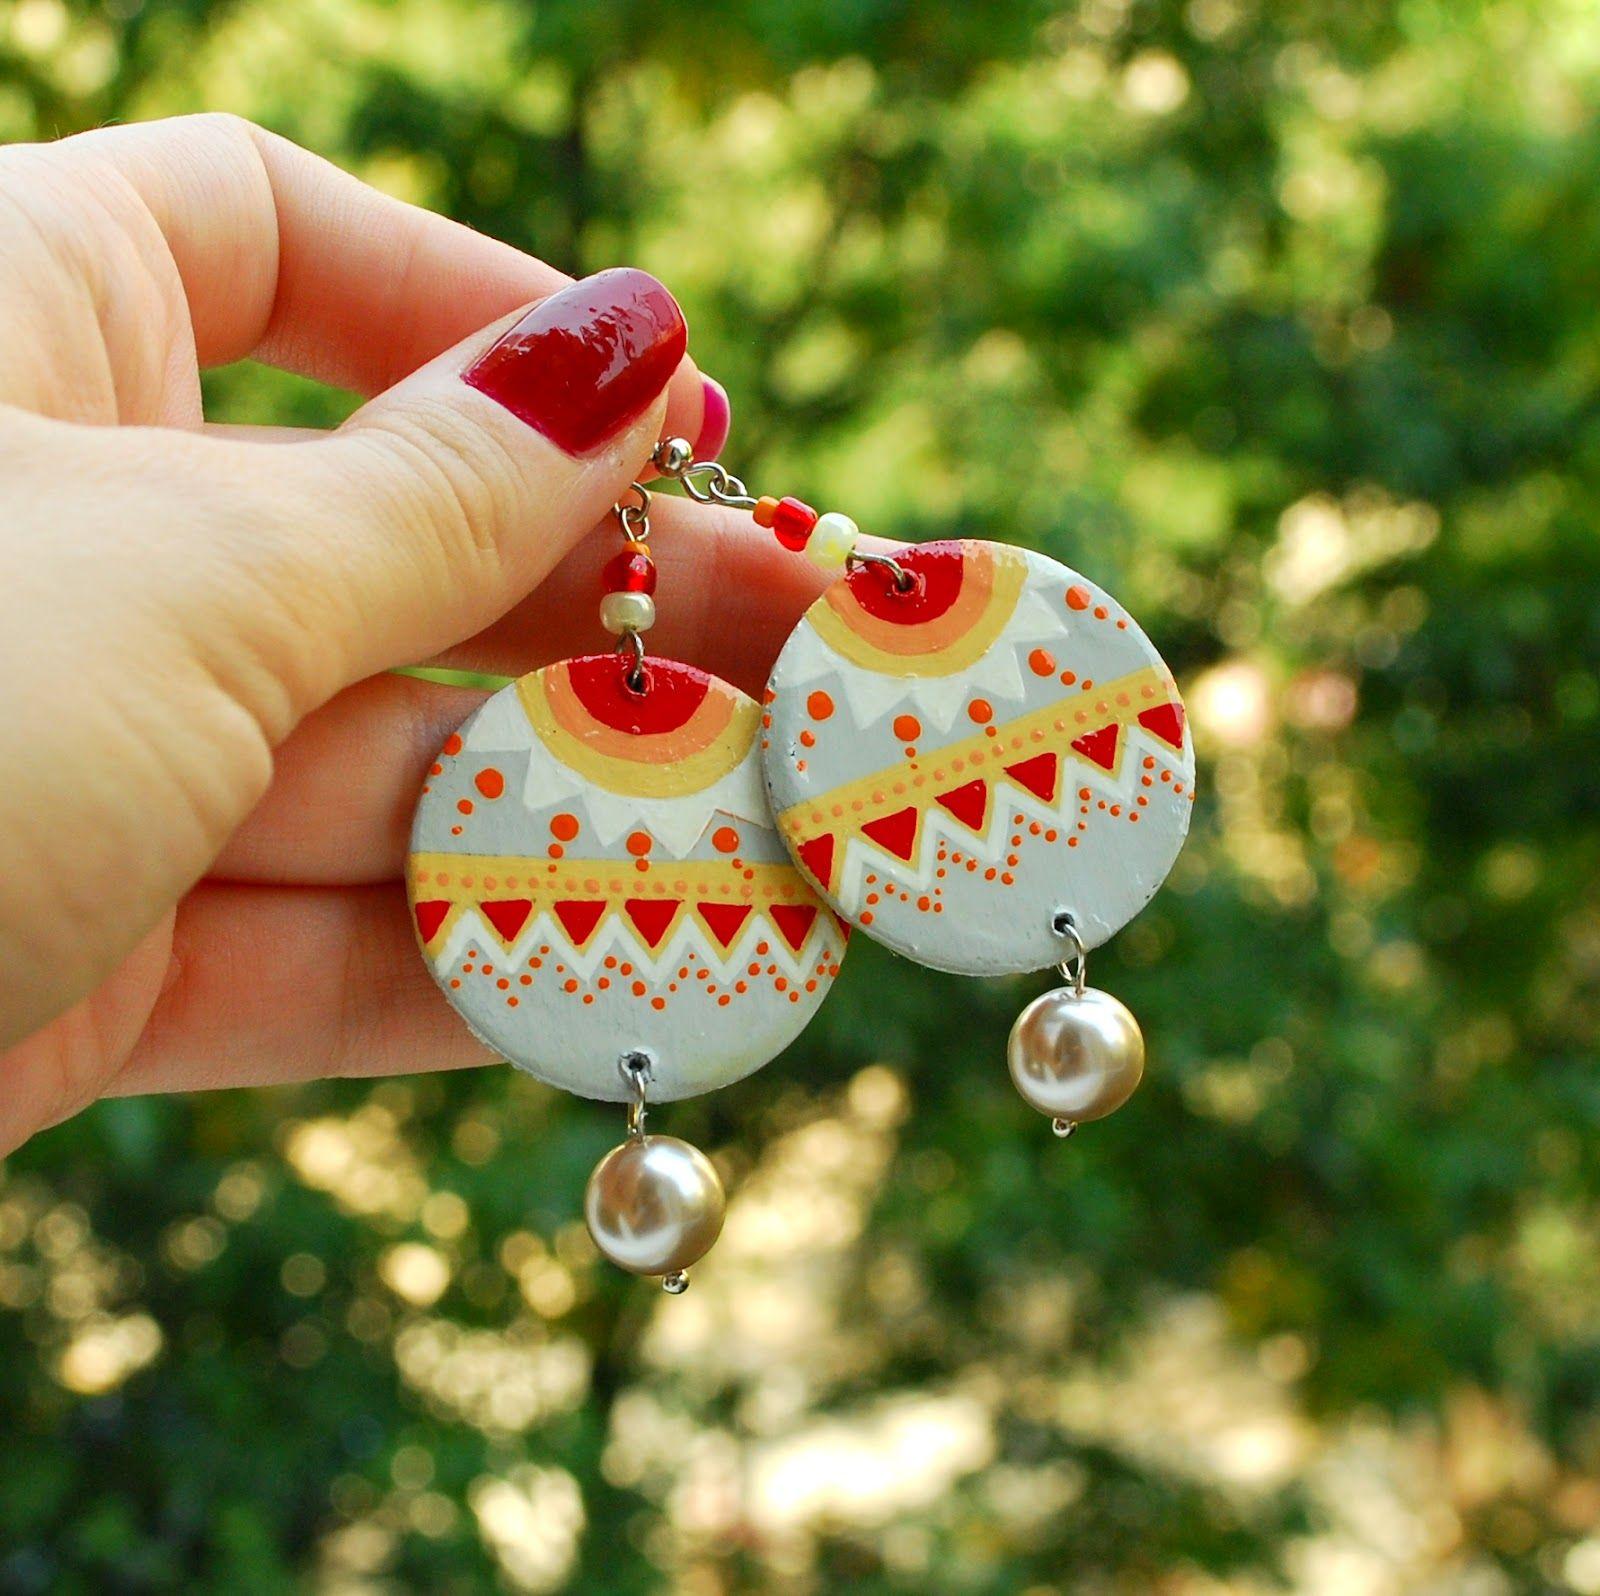 Pumpkin Design | Fabric jewelry, Handmade jewelry diy, Handmade fashion  jewelry